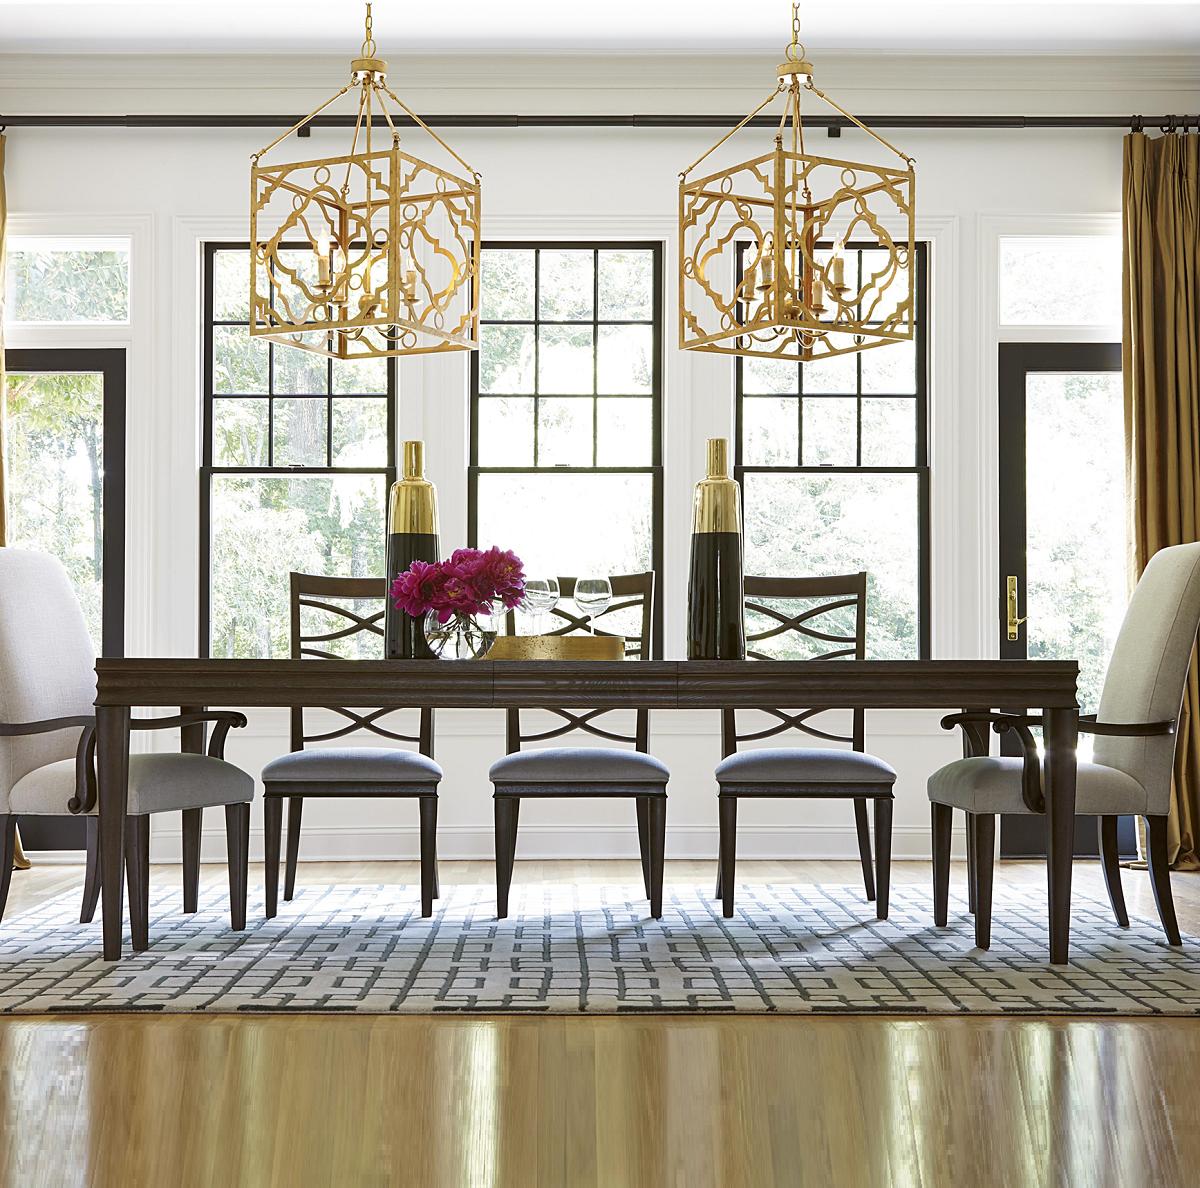 "California Rustic Oak Extending Dining Table 114""  Rustic White Unique Oak Dining Room Design Decoration"